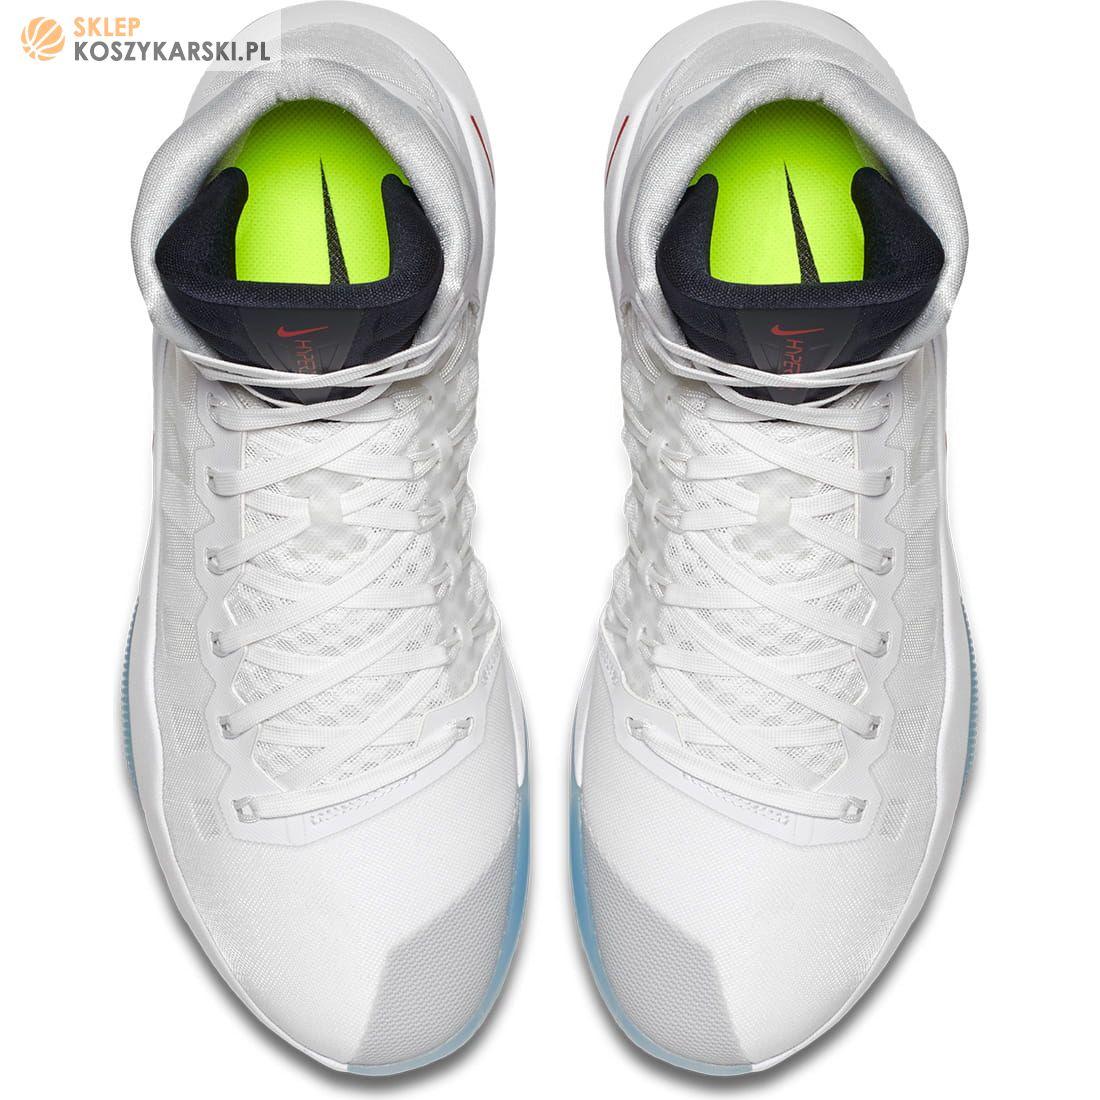 buty do koszykówki nike hyperdunk 2016 844359-146